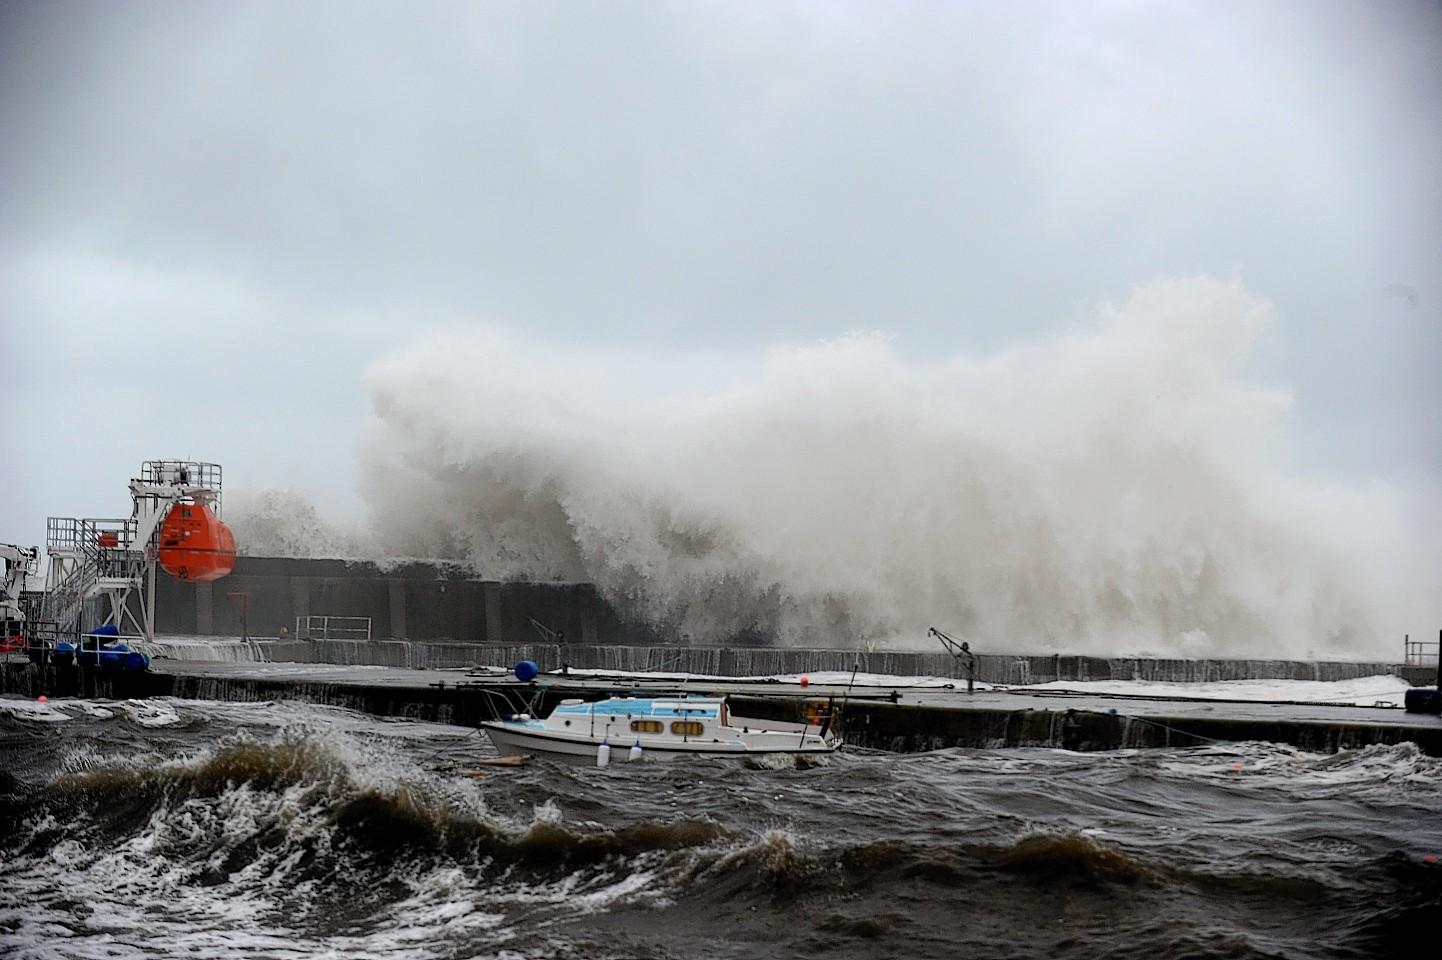 Waves batter Stonehaven Harbour